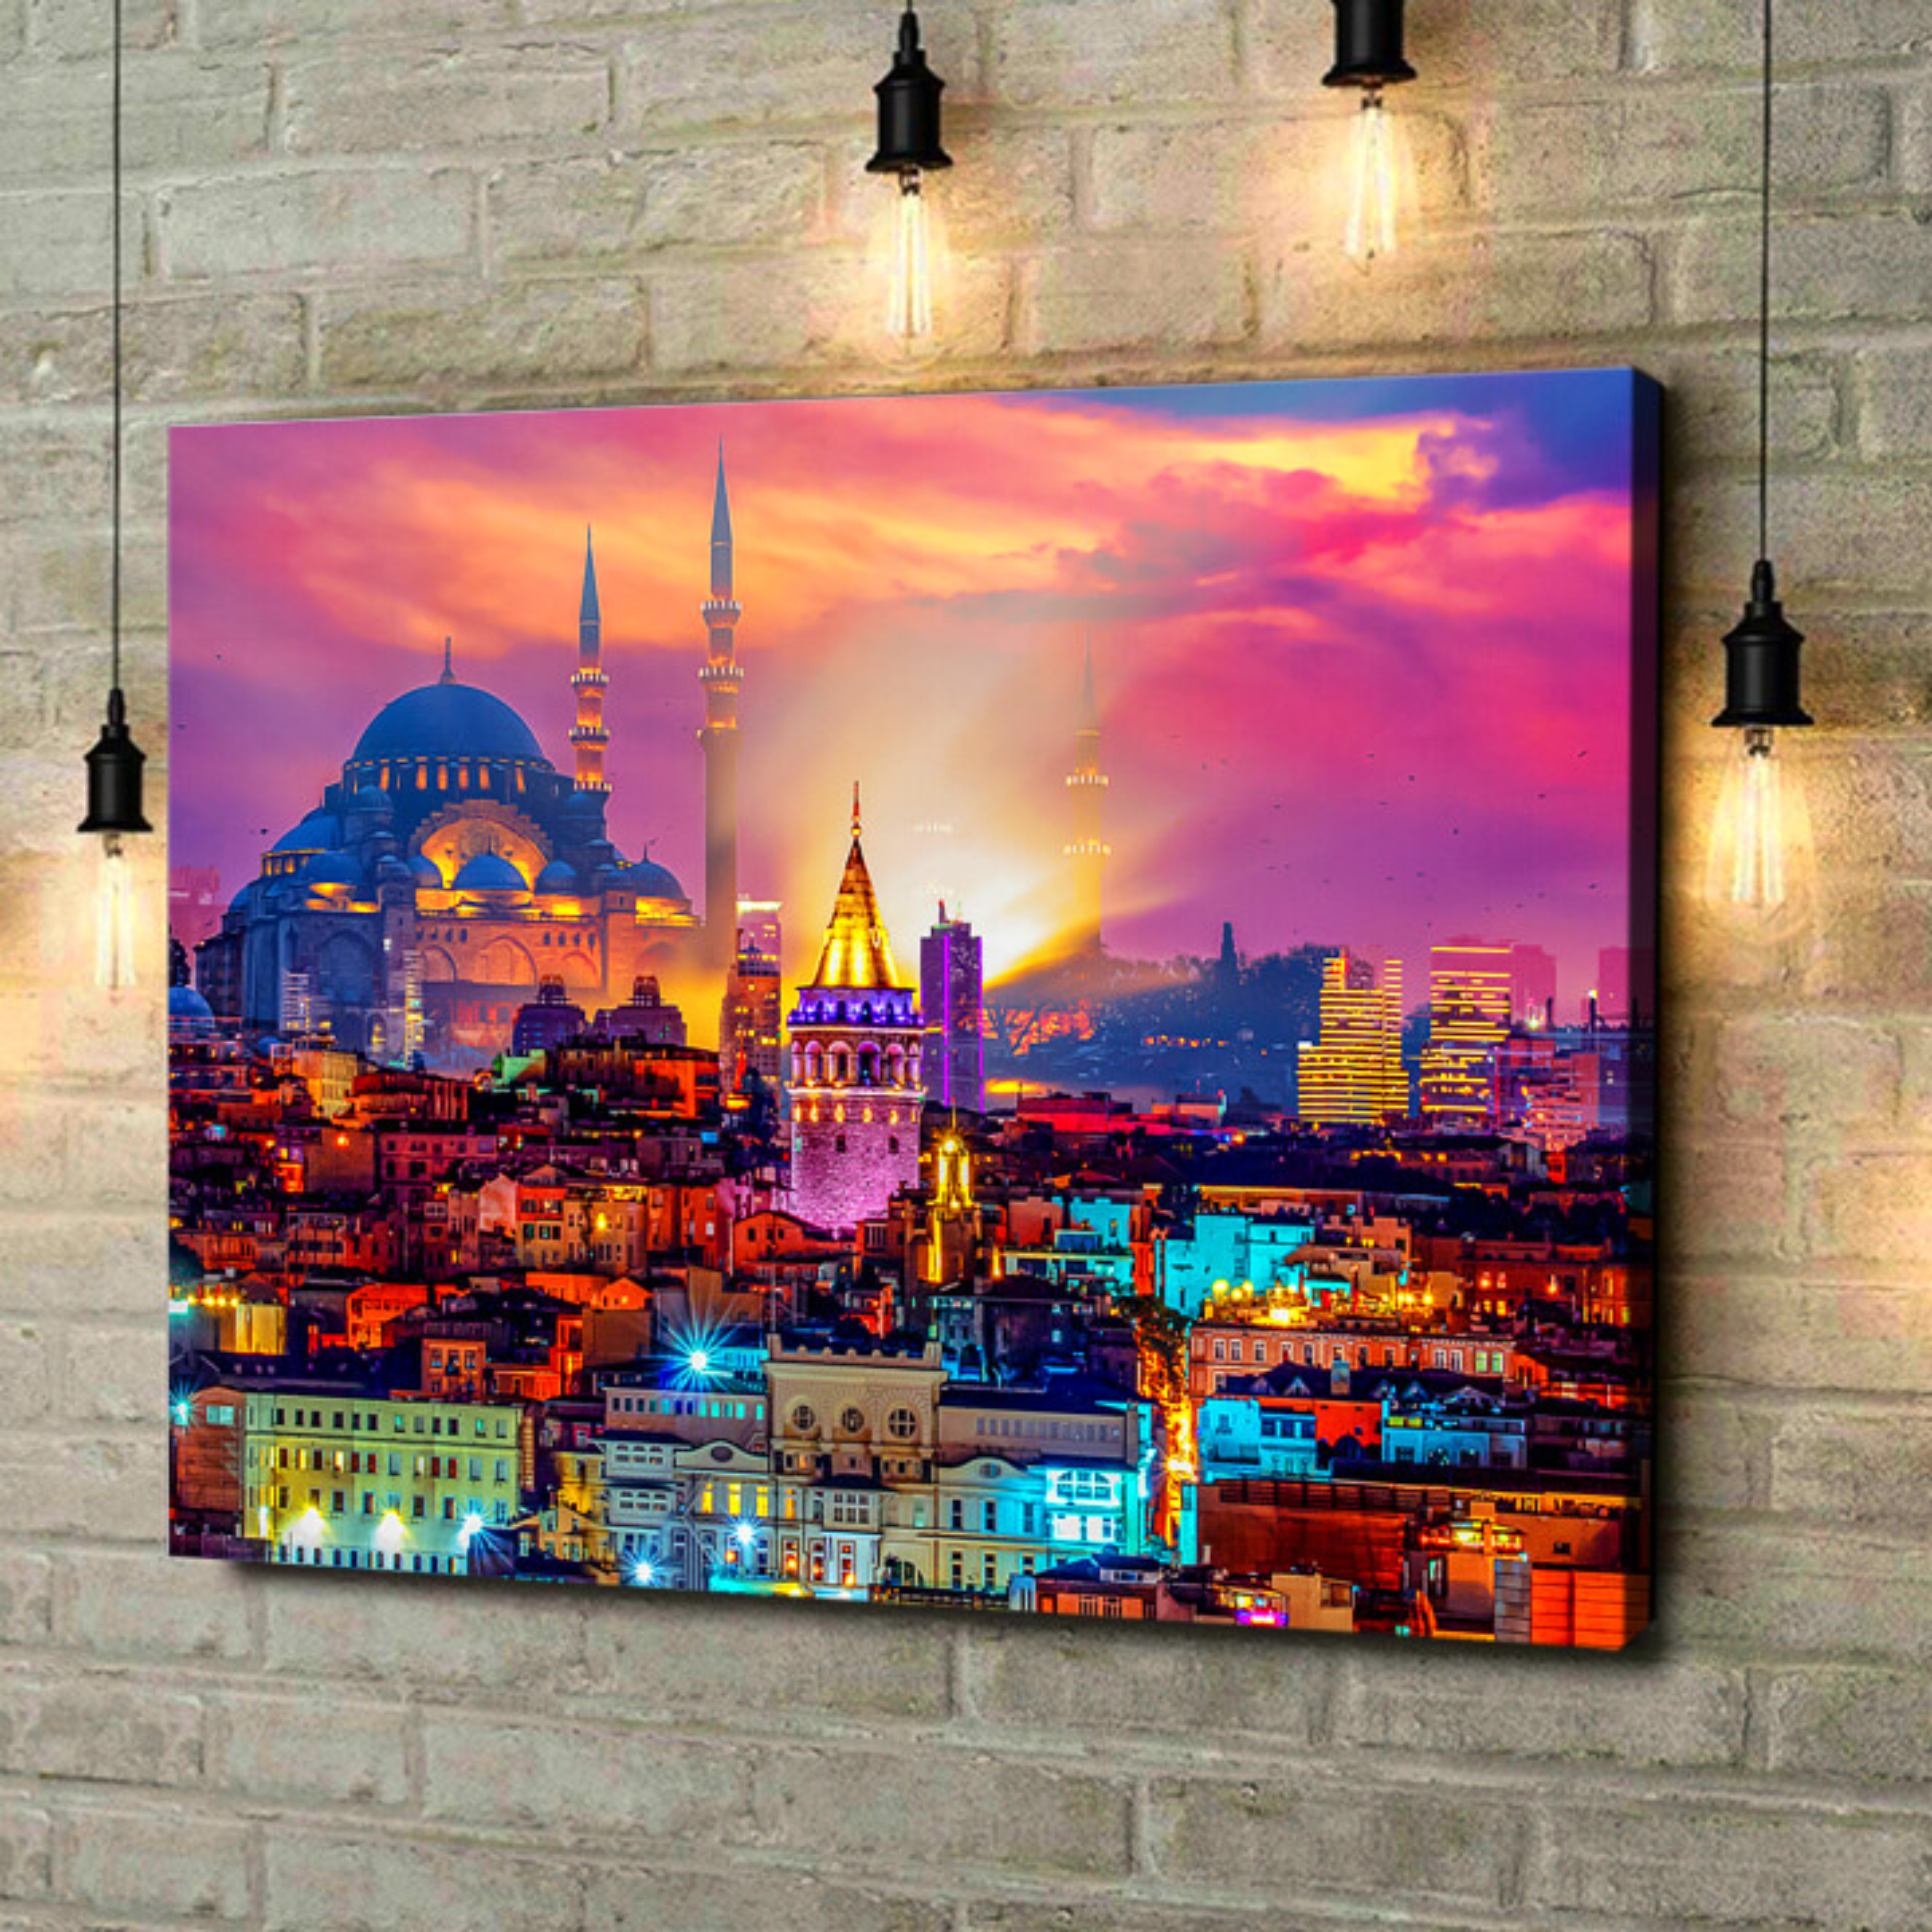 Leinwandbild personalisiert Istanbul Skyline